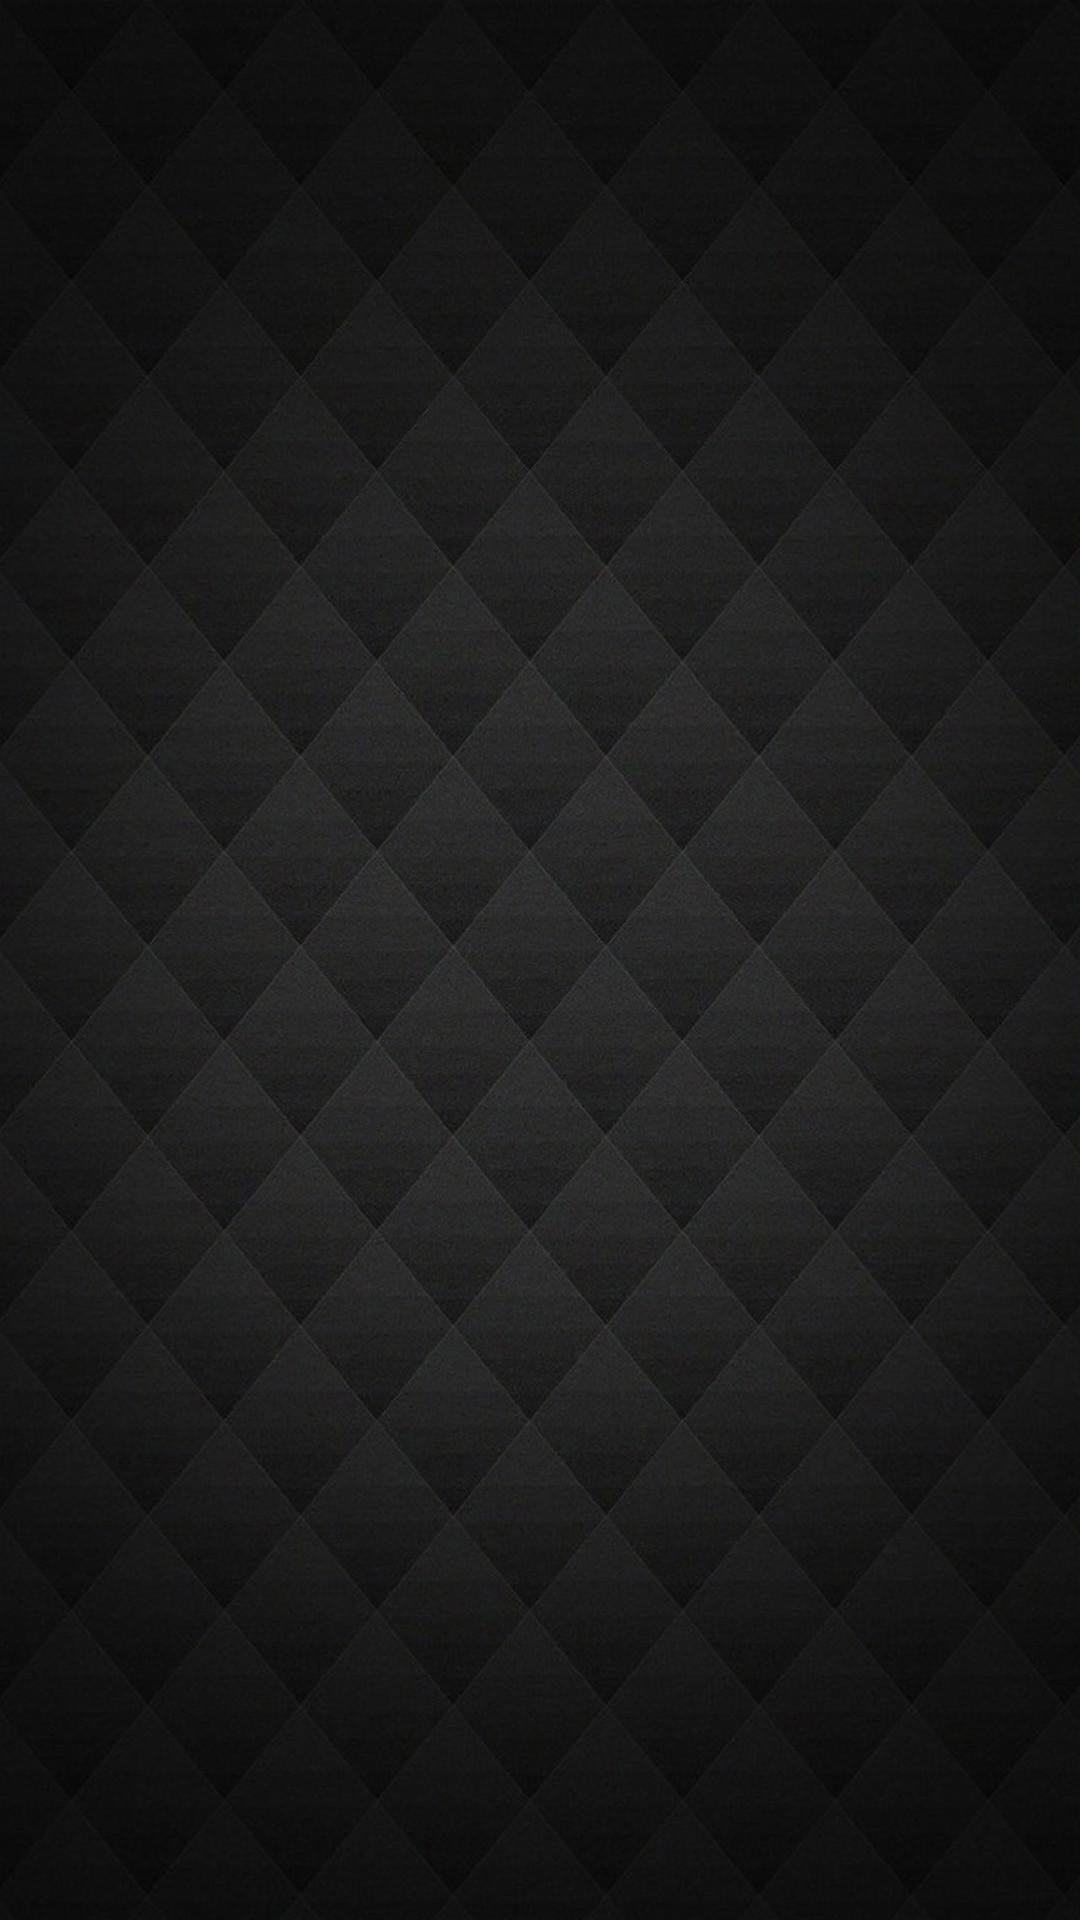 Carbon Fibre Wallpapers – Wallpaper Cave | Best Games Wallpapers |  Pinterest | Carbon fiber and Wallpaper